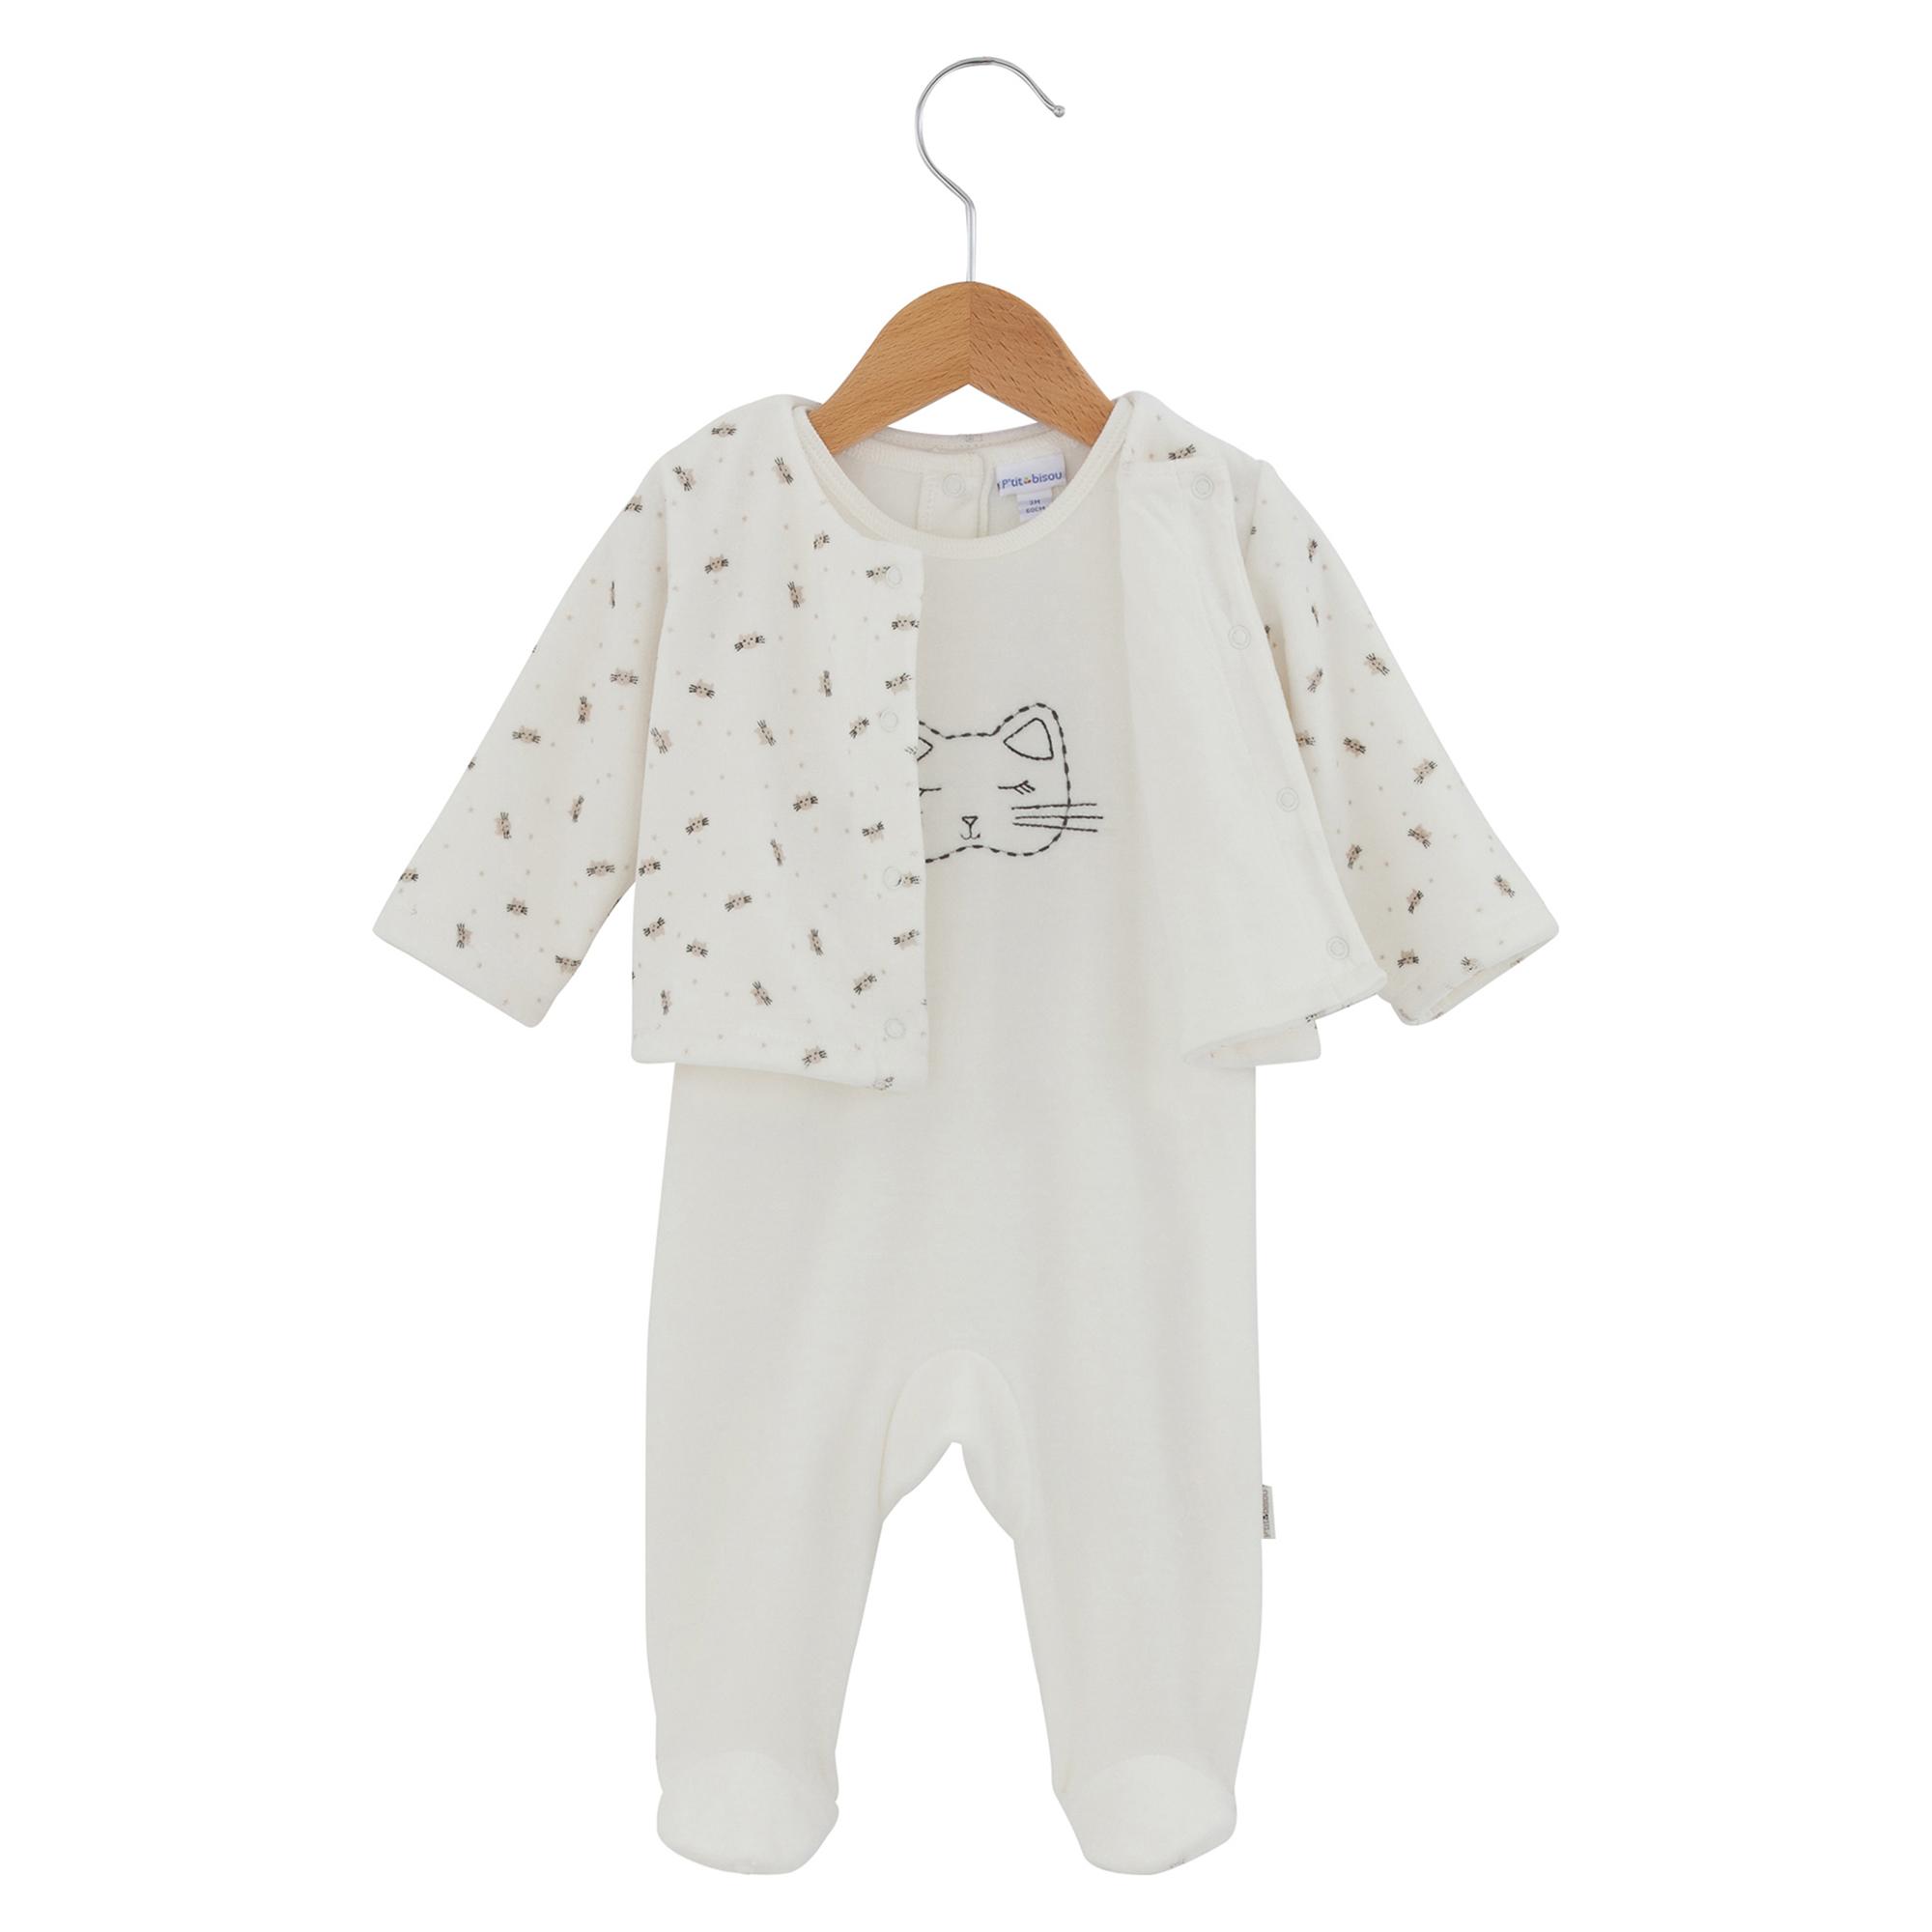 f1baa3aa445a1 Ensemble pyjama collection Mini Cat Ecru de P tit Bisou Trousseau ...